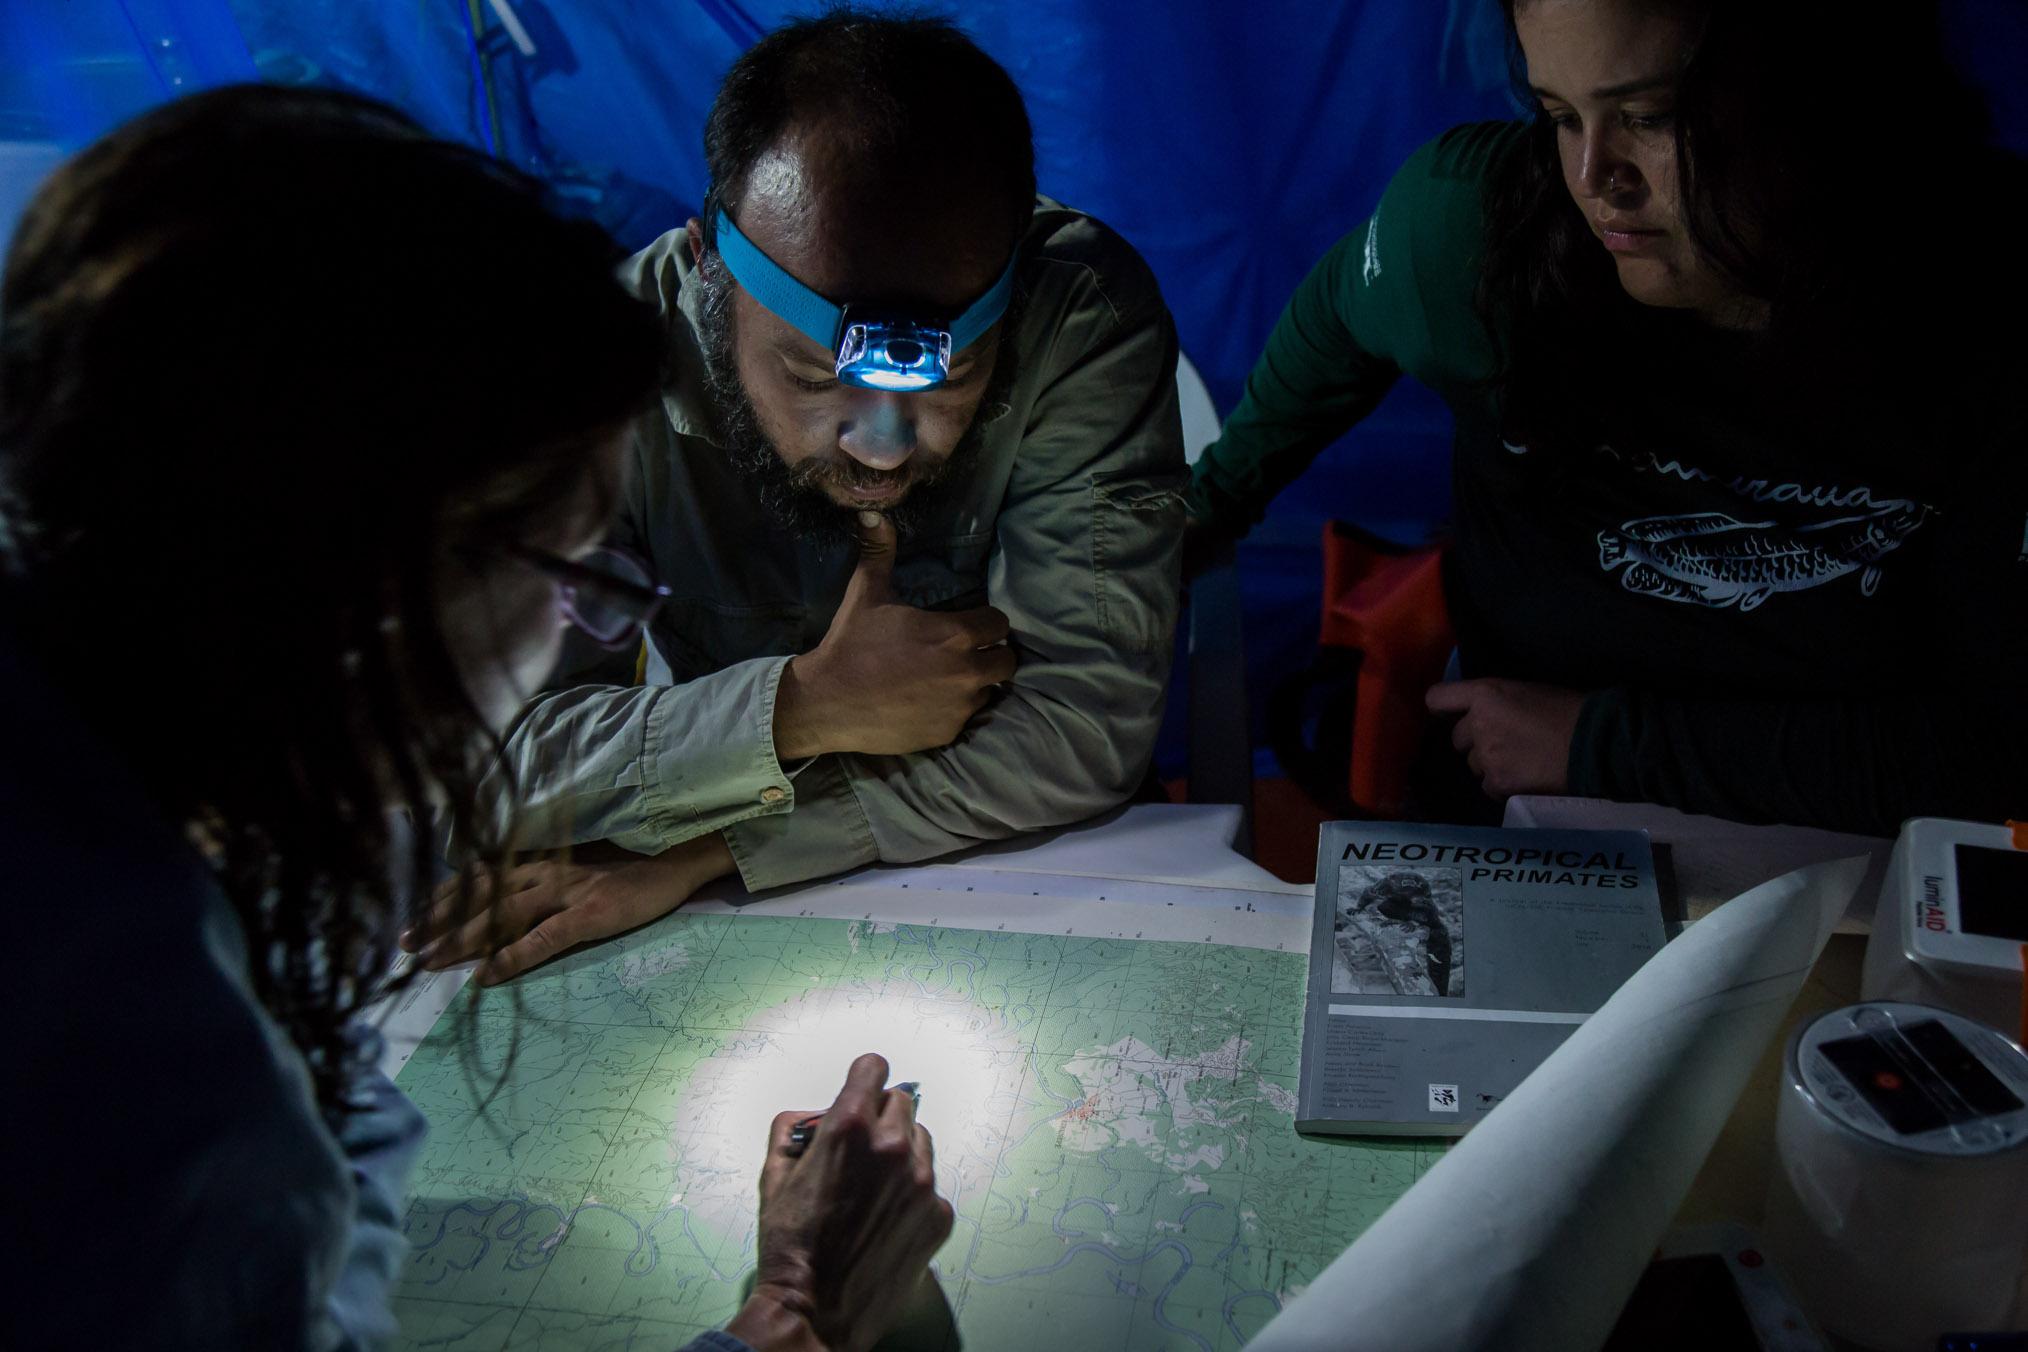 Scientists Laura Marsh (far left), Felipe Ennes, and Lísley Lemos study maps to determine the best areas to survey along the Eiru River.